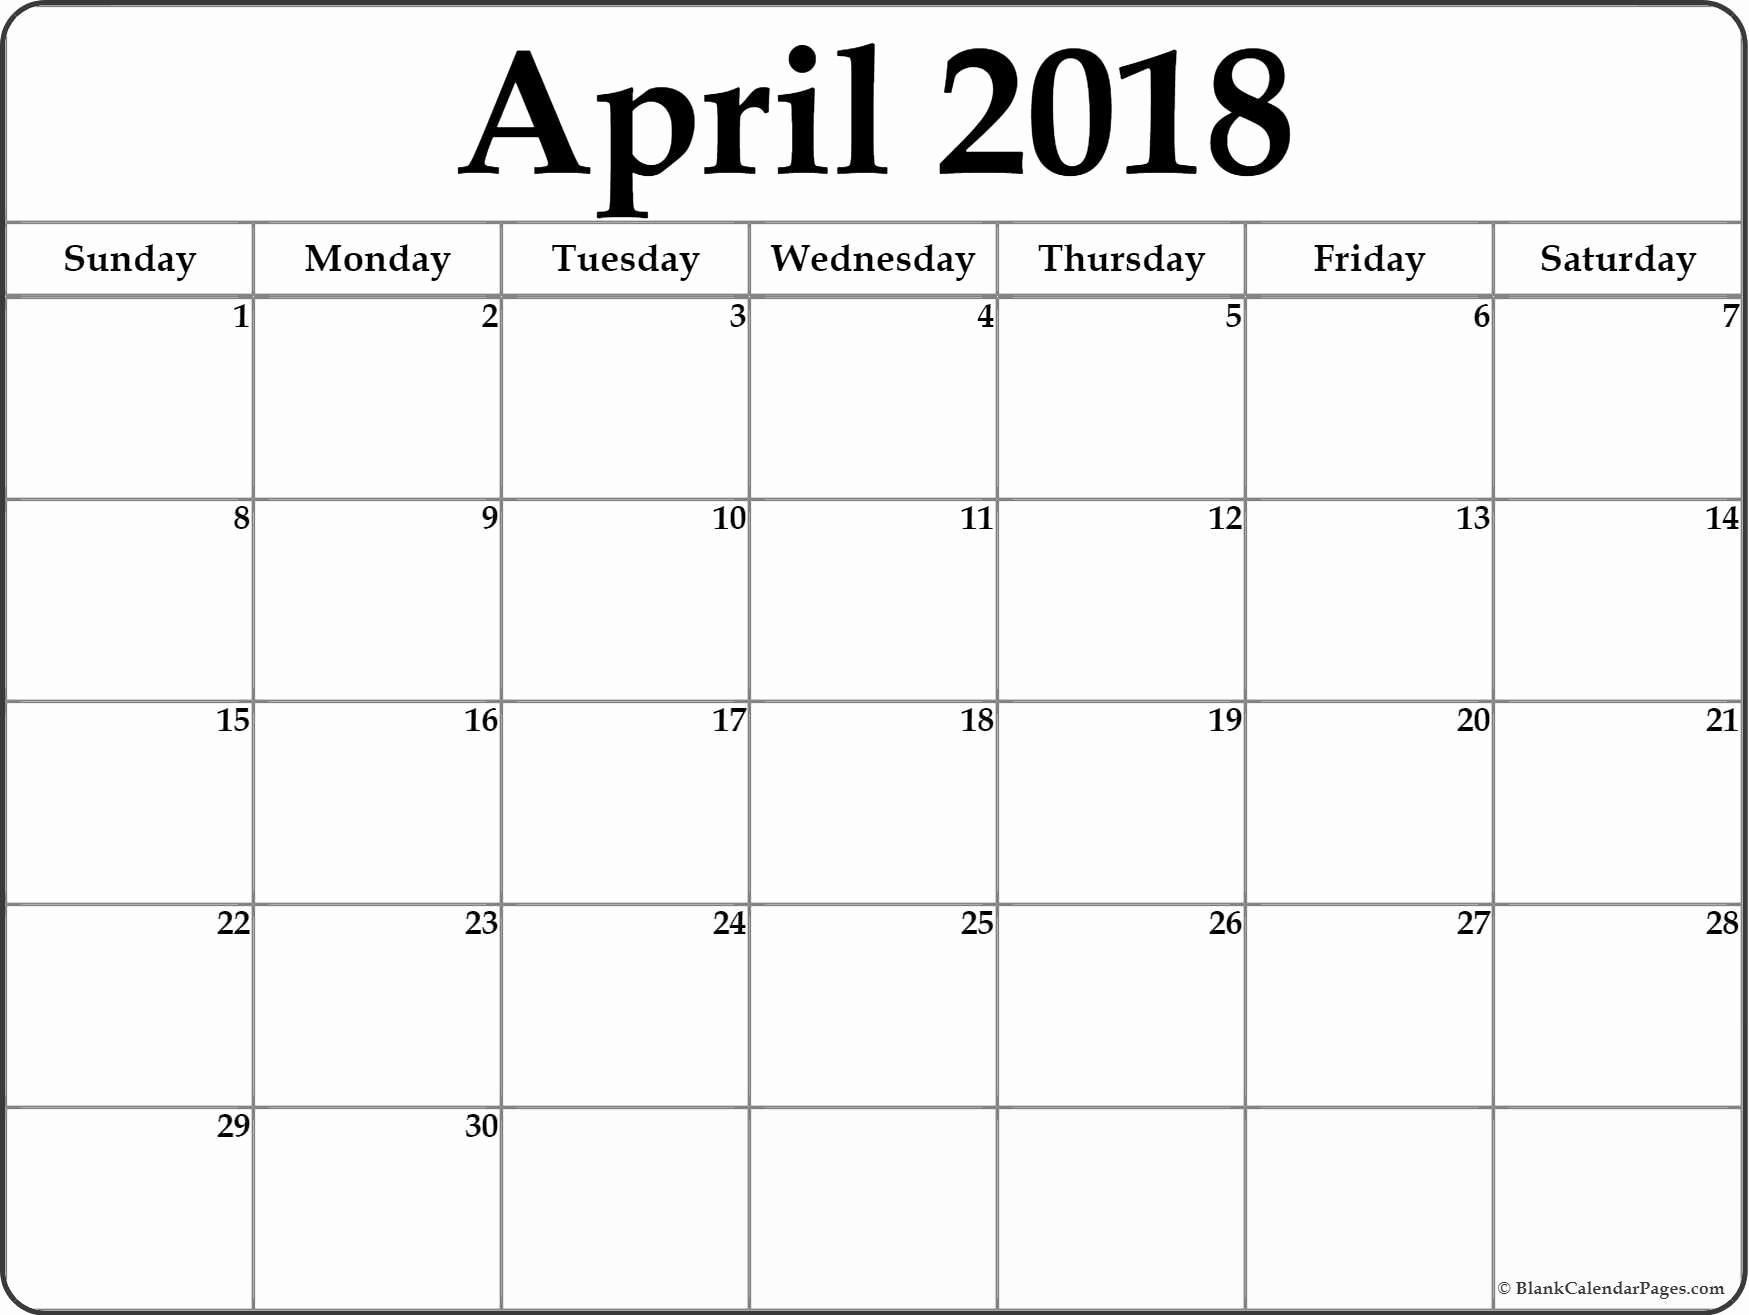 Blank April 2018 Calendar Template Best Of April 2018 Blank Calendar Templates